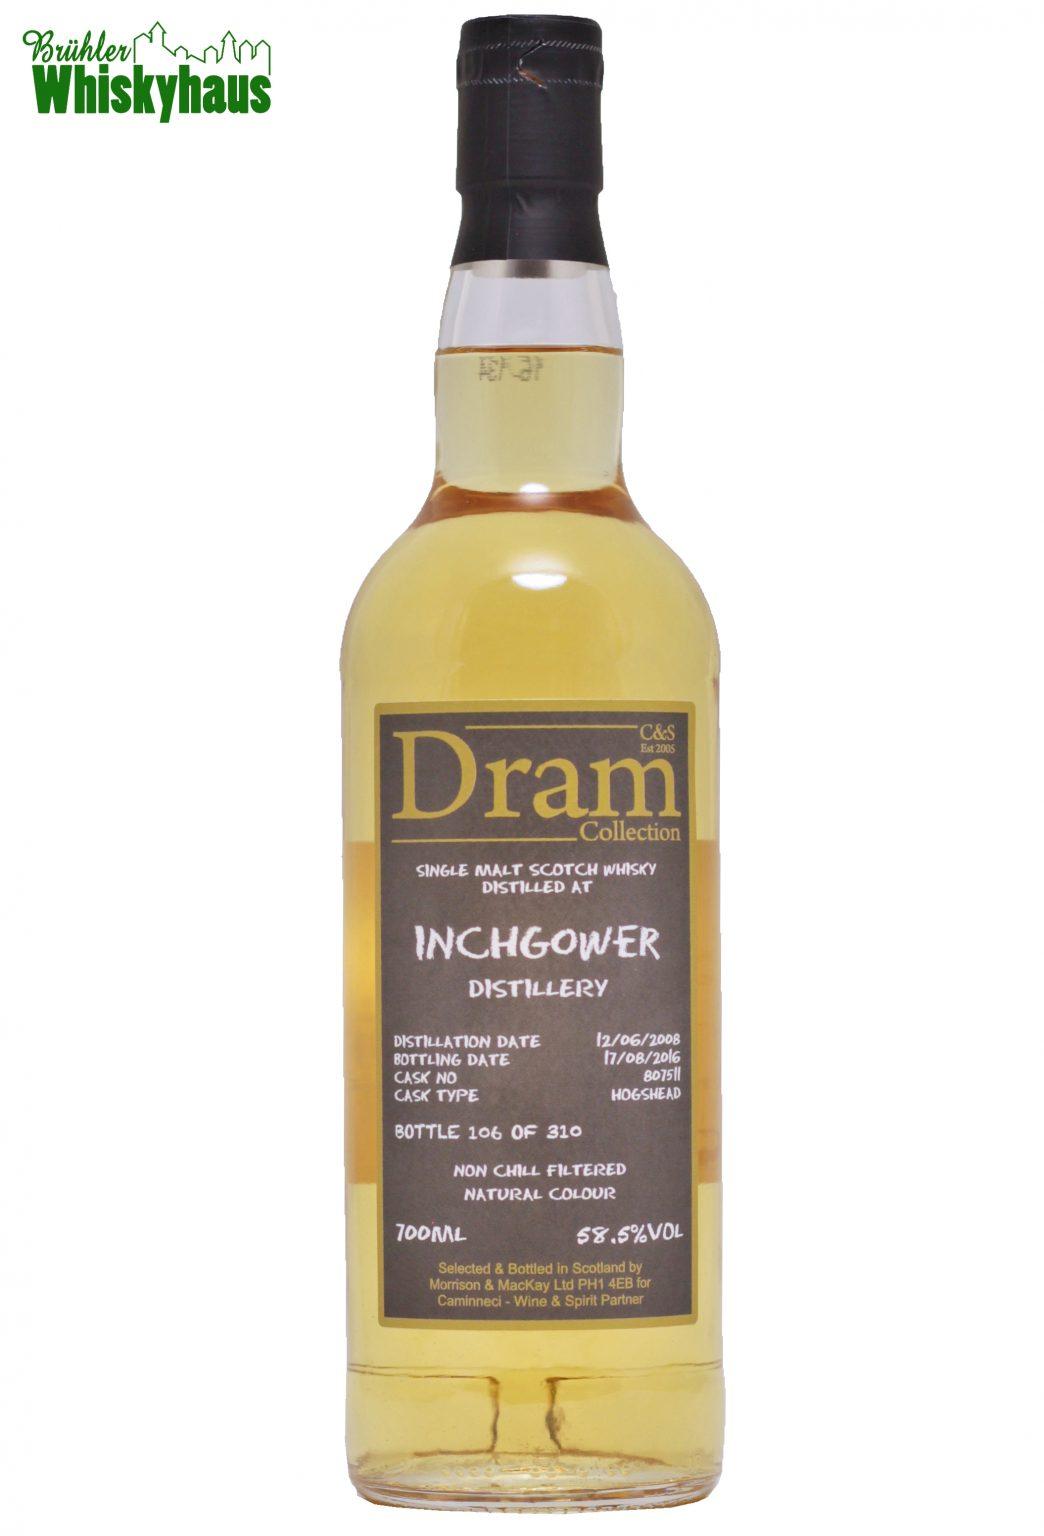 Inchgower 8 Jahre - Hogshead N^ 807511 - C&S Dram Collection - Single Malt Scotch Whisky